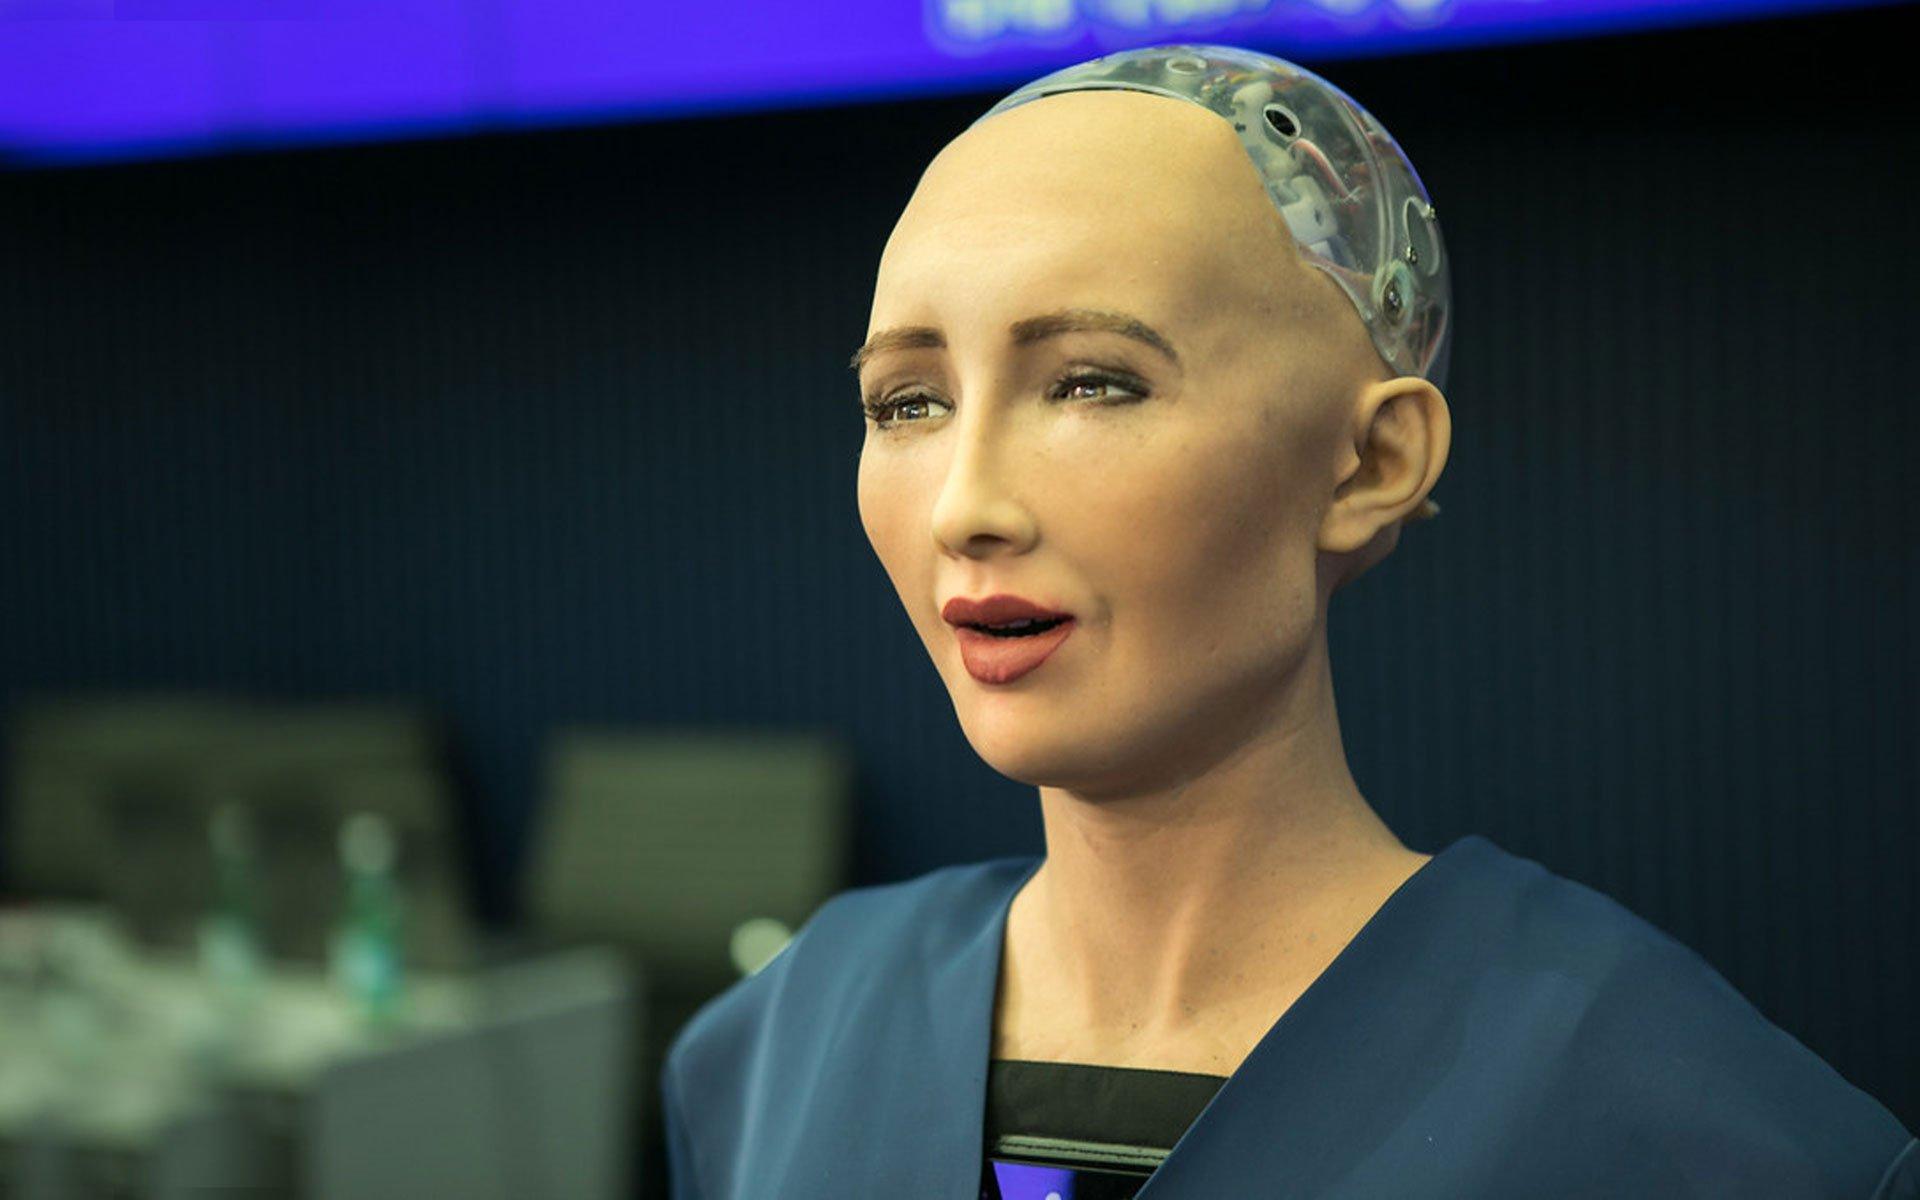 sophia artificial intelligence robot